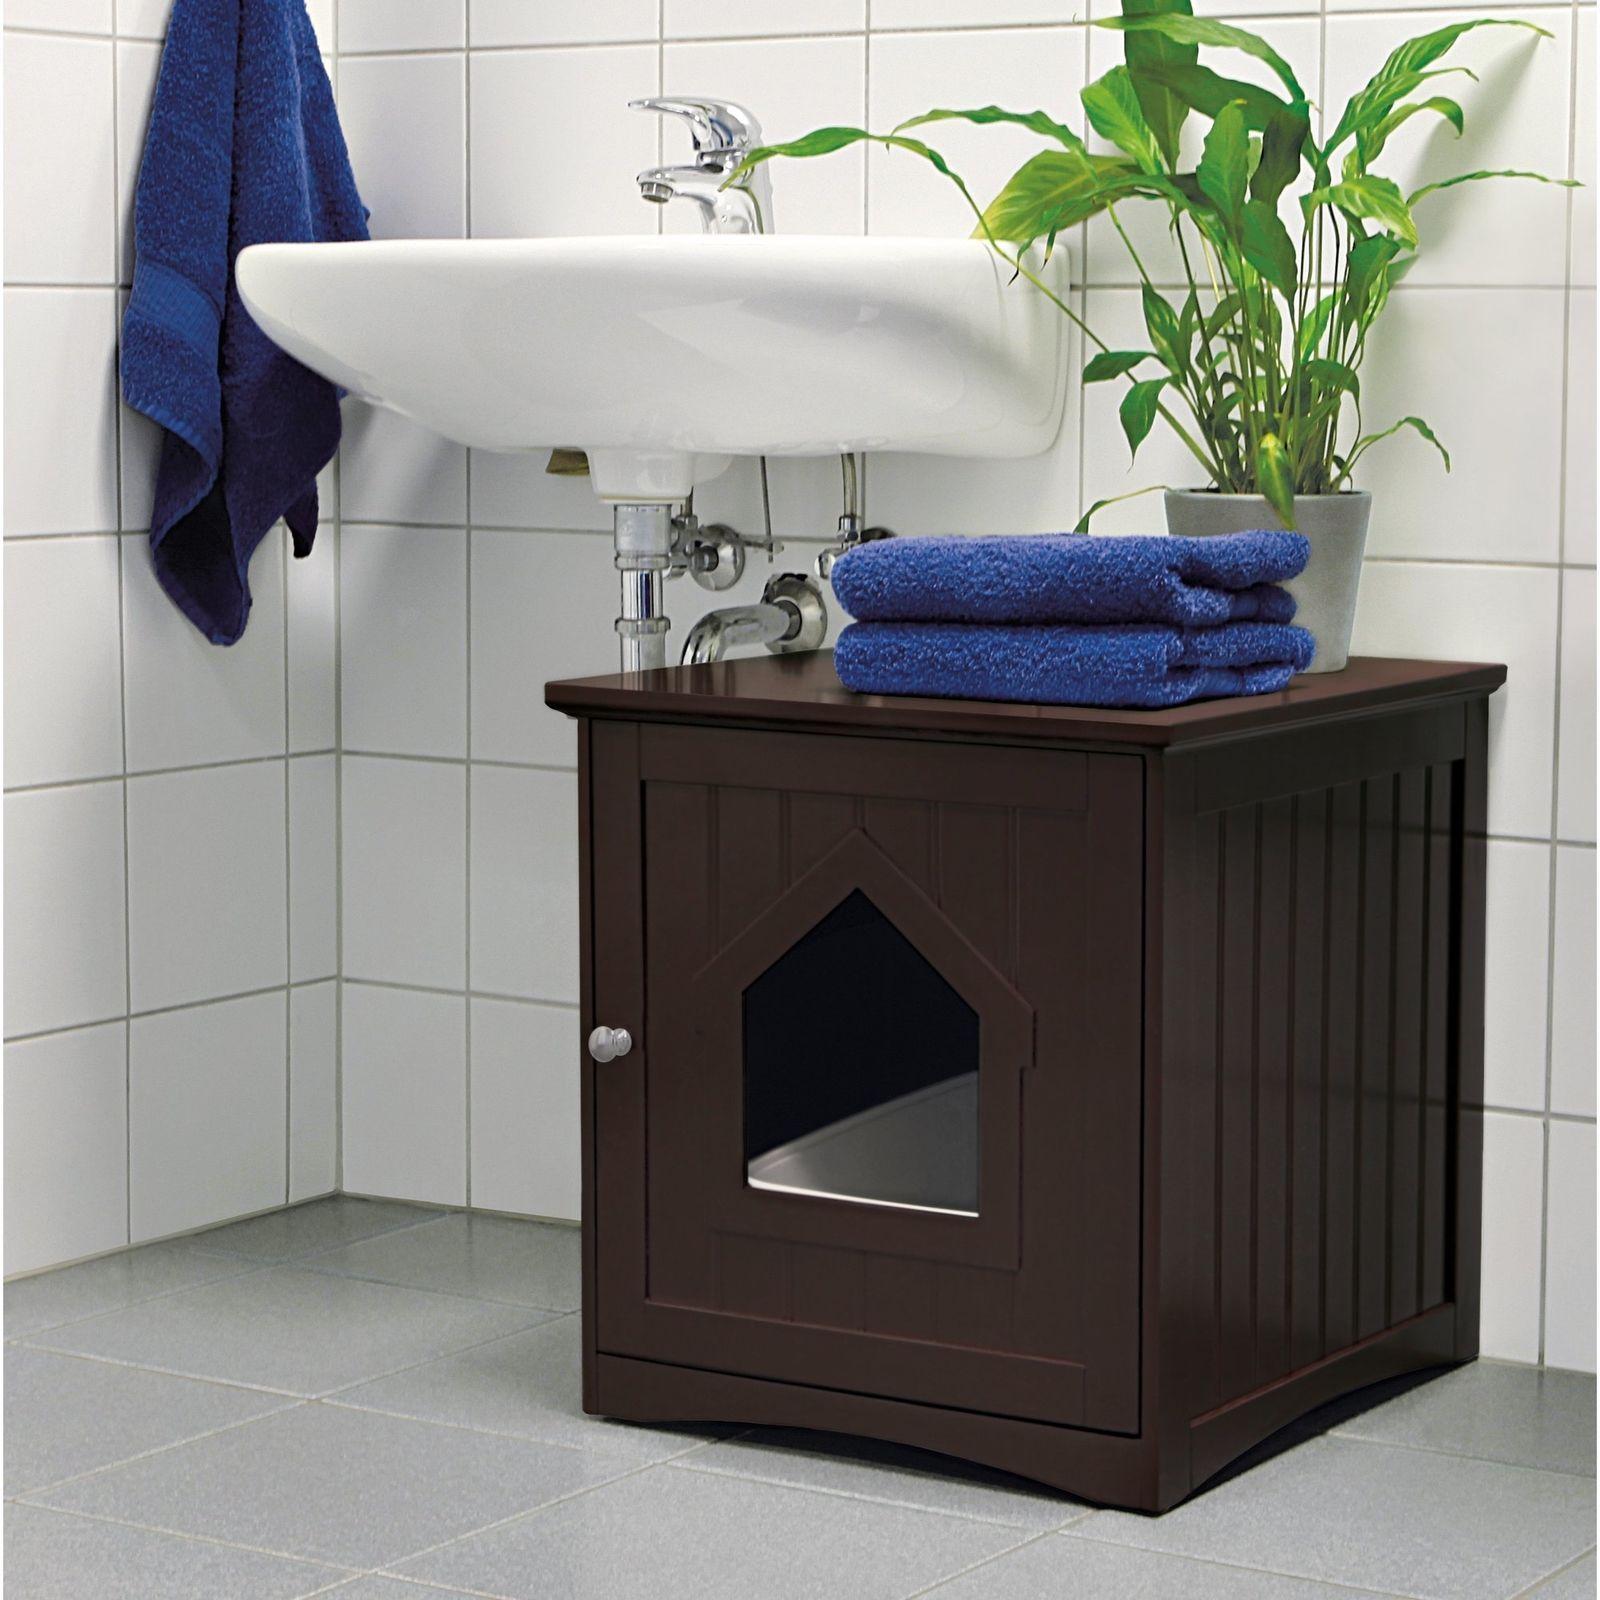 Brown Cat Home Litter Box Enclosure Wood Indoor Pet House